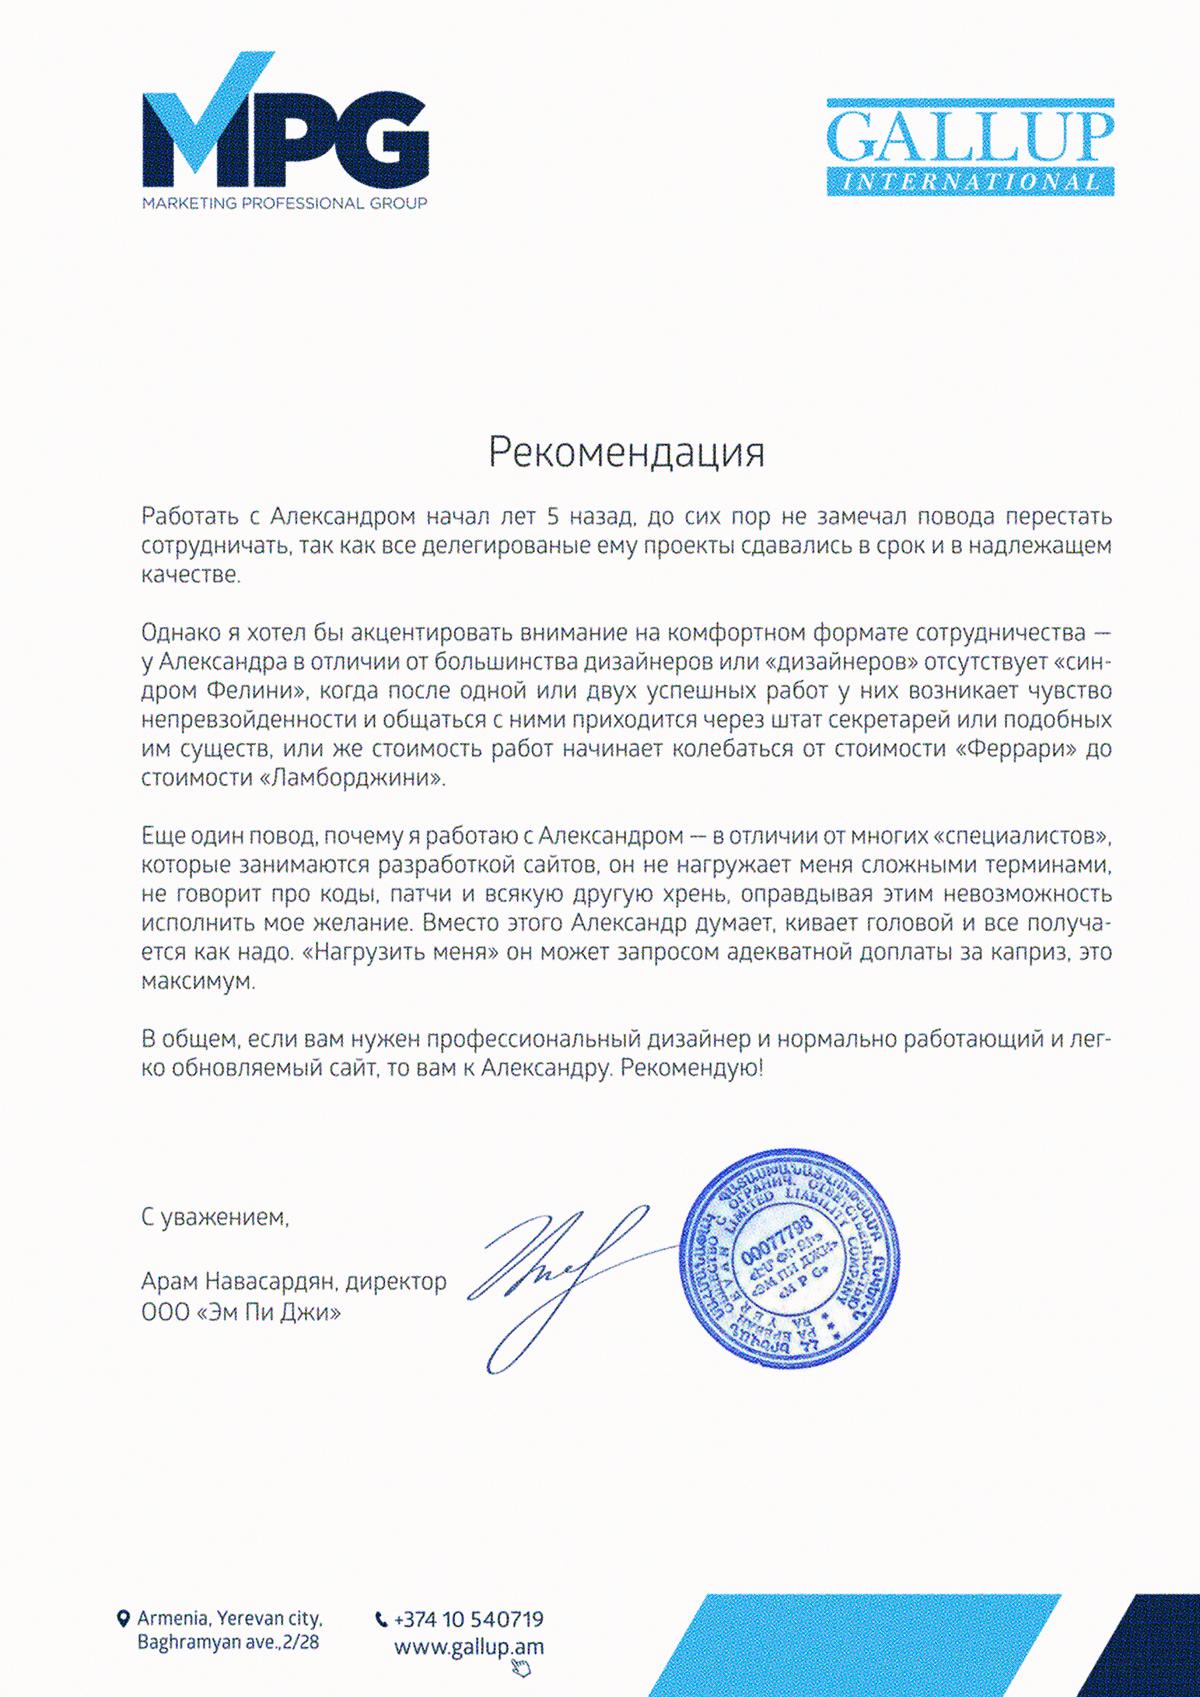 Отзыв от представителя Gallup International в Армении